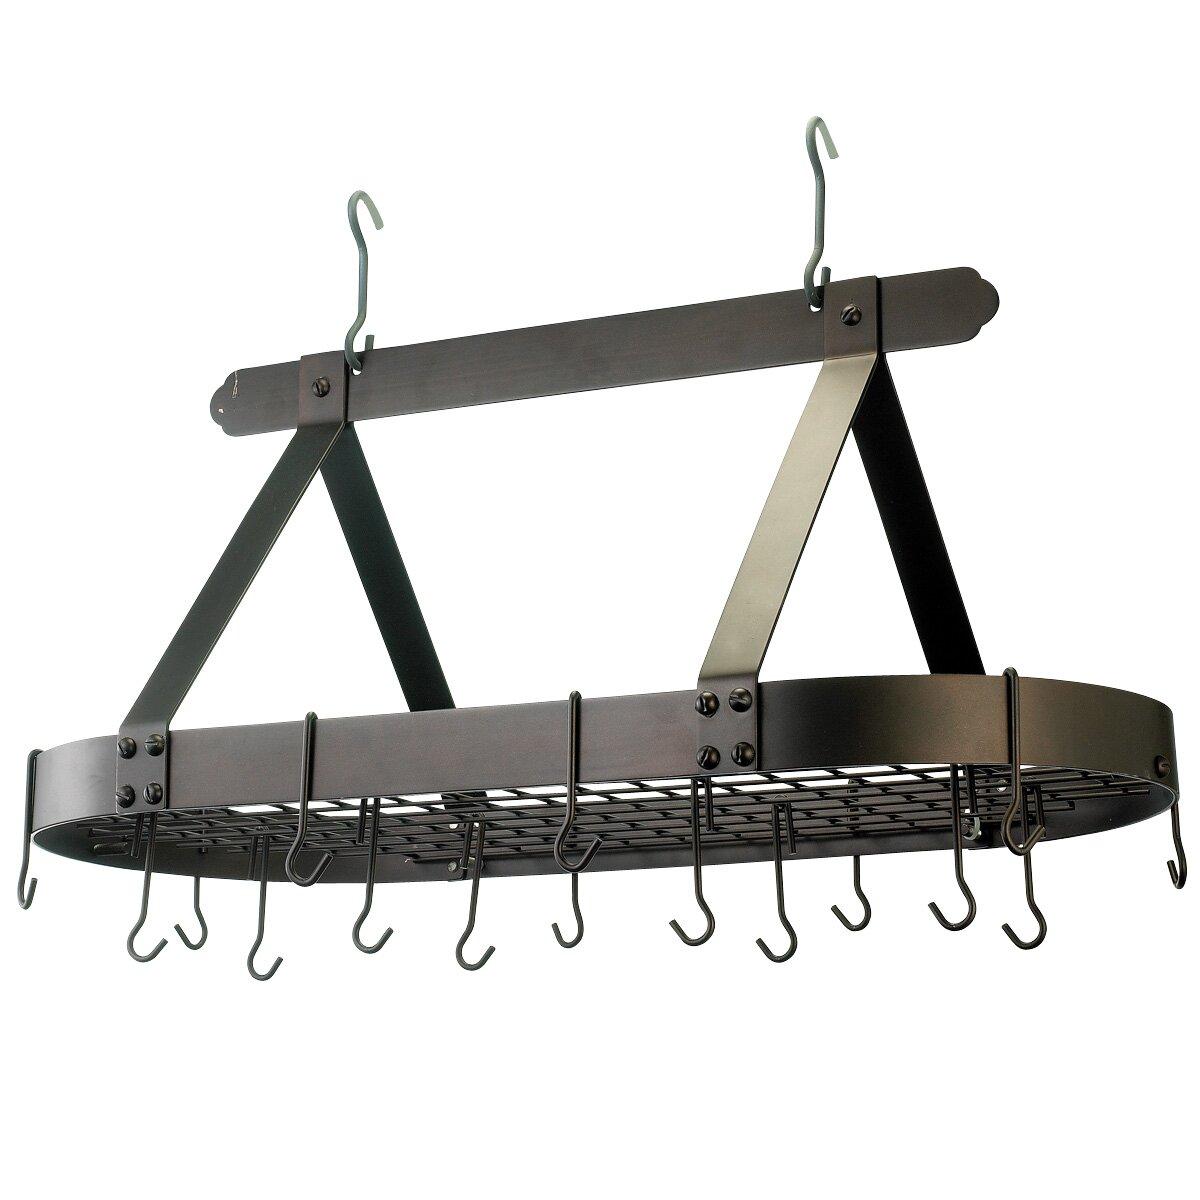 old dutch oval pot rack with 16 hooks reviews wayfair. Black Bedroom Furniture Sets. Home Design Ideas